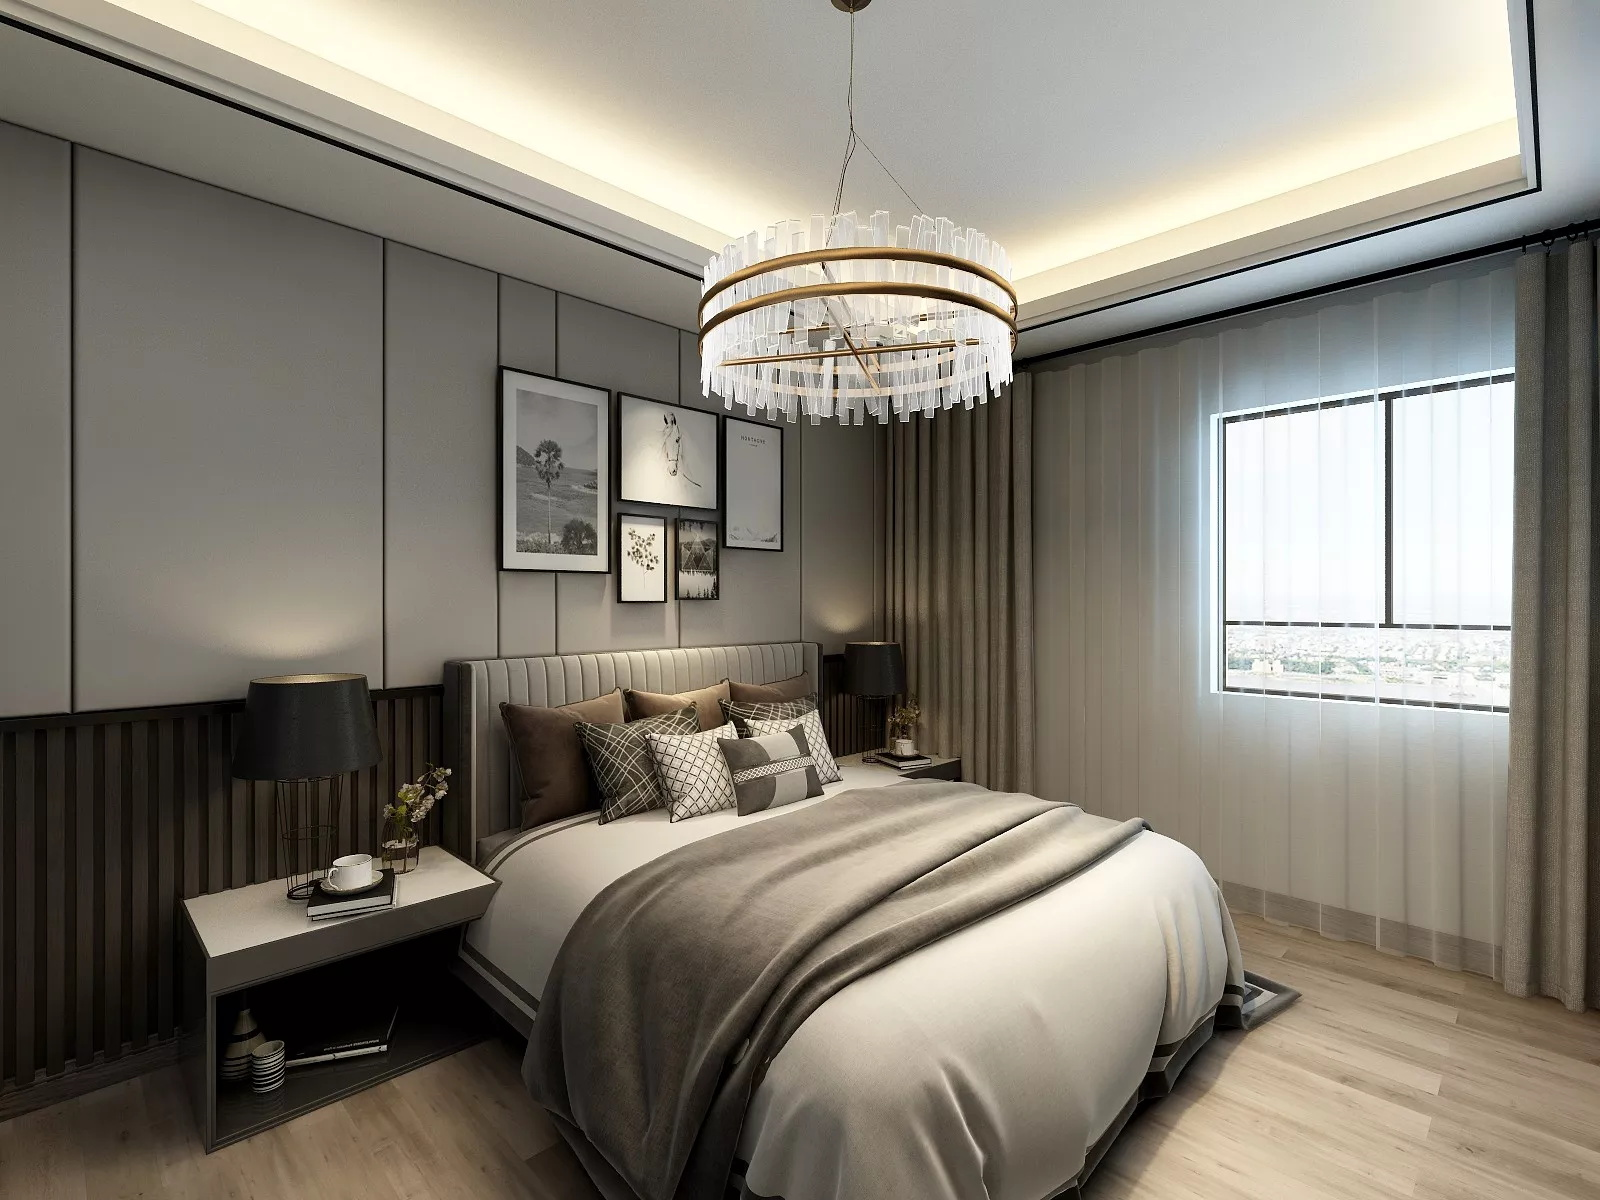 103m²北欧风格家居装修效果图